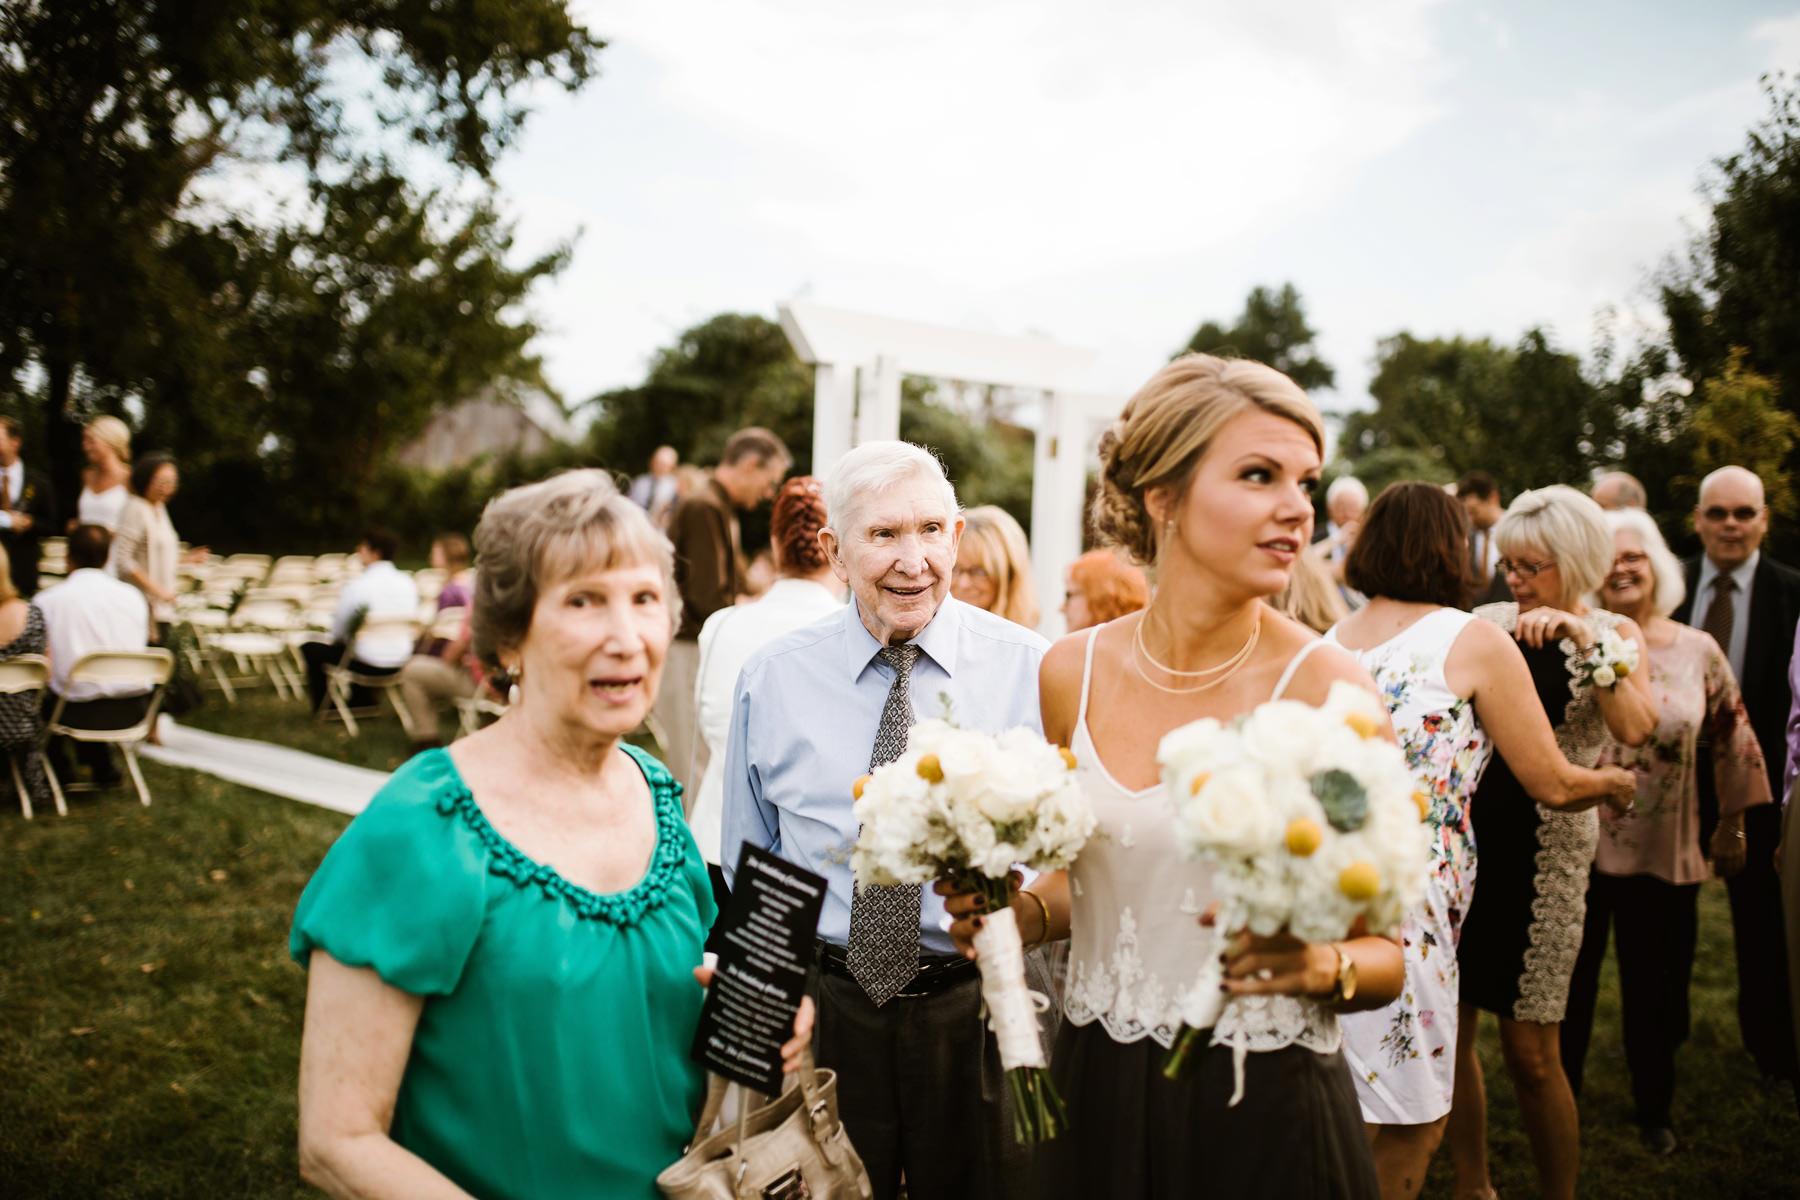 Alldredge Orchard Kansas City_Kindling Wedding Photography BLOG 51.JPG